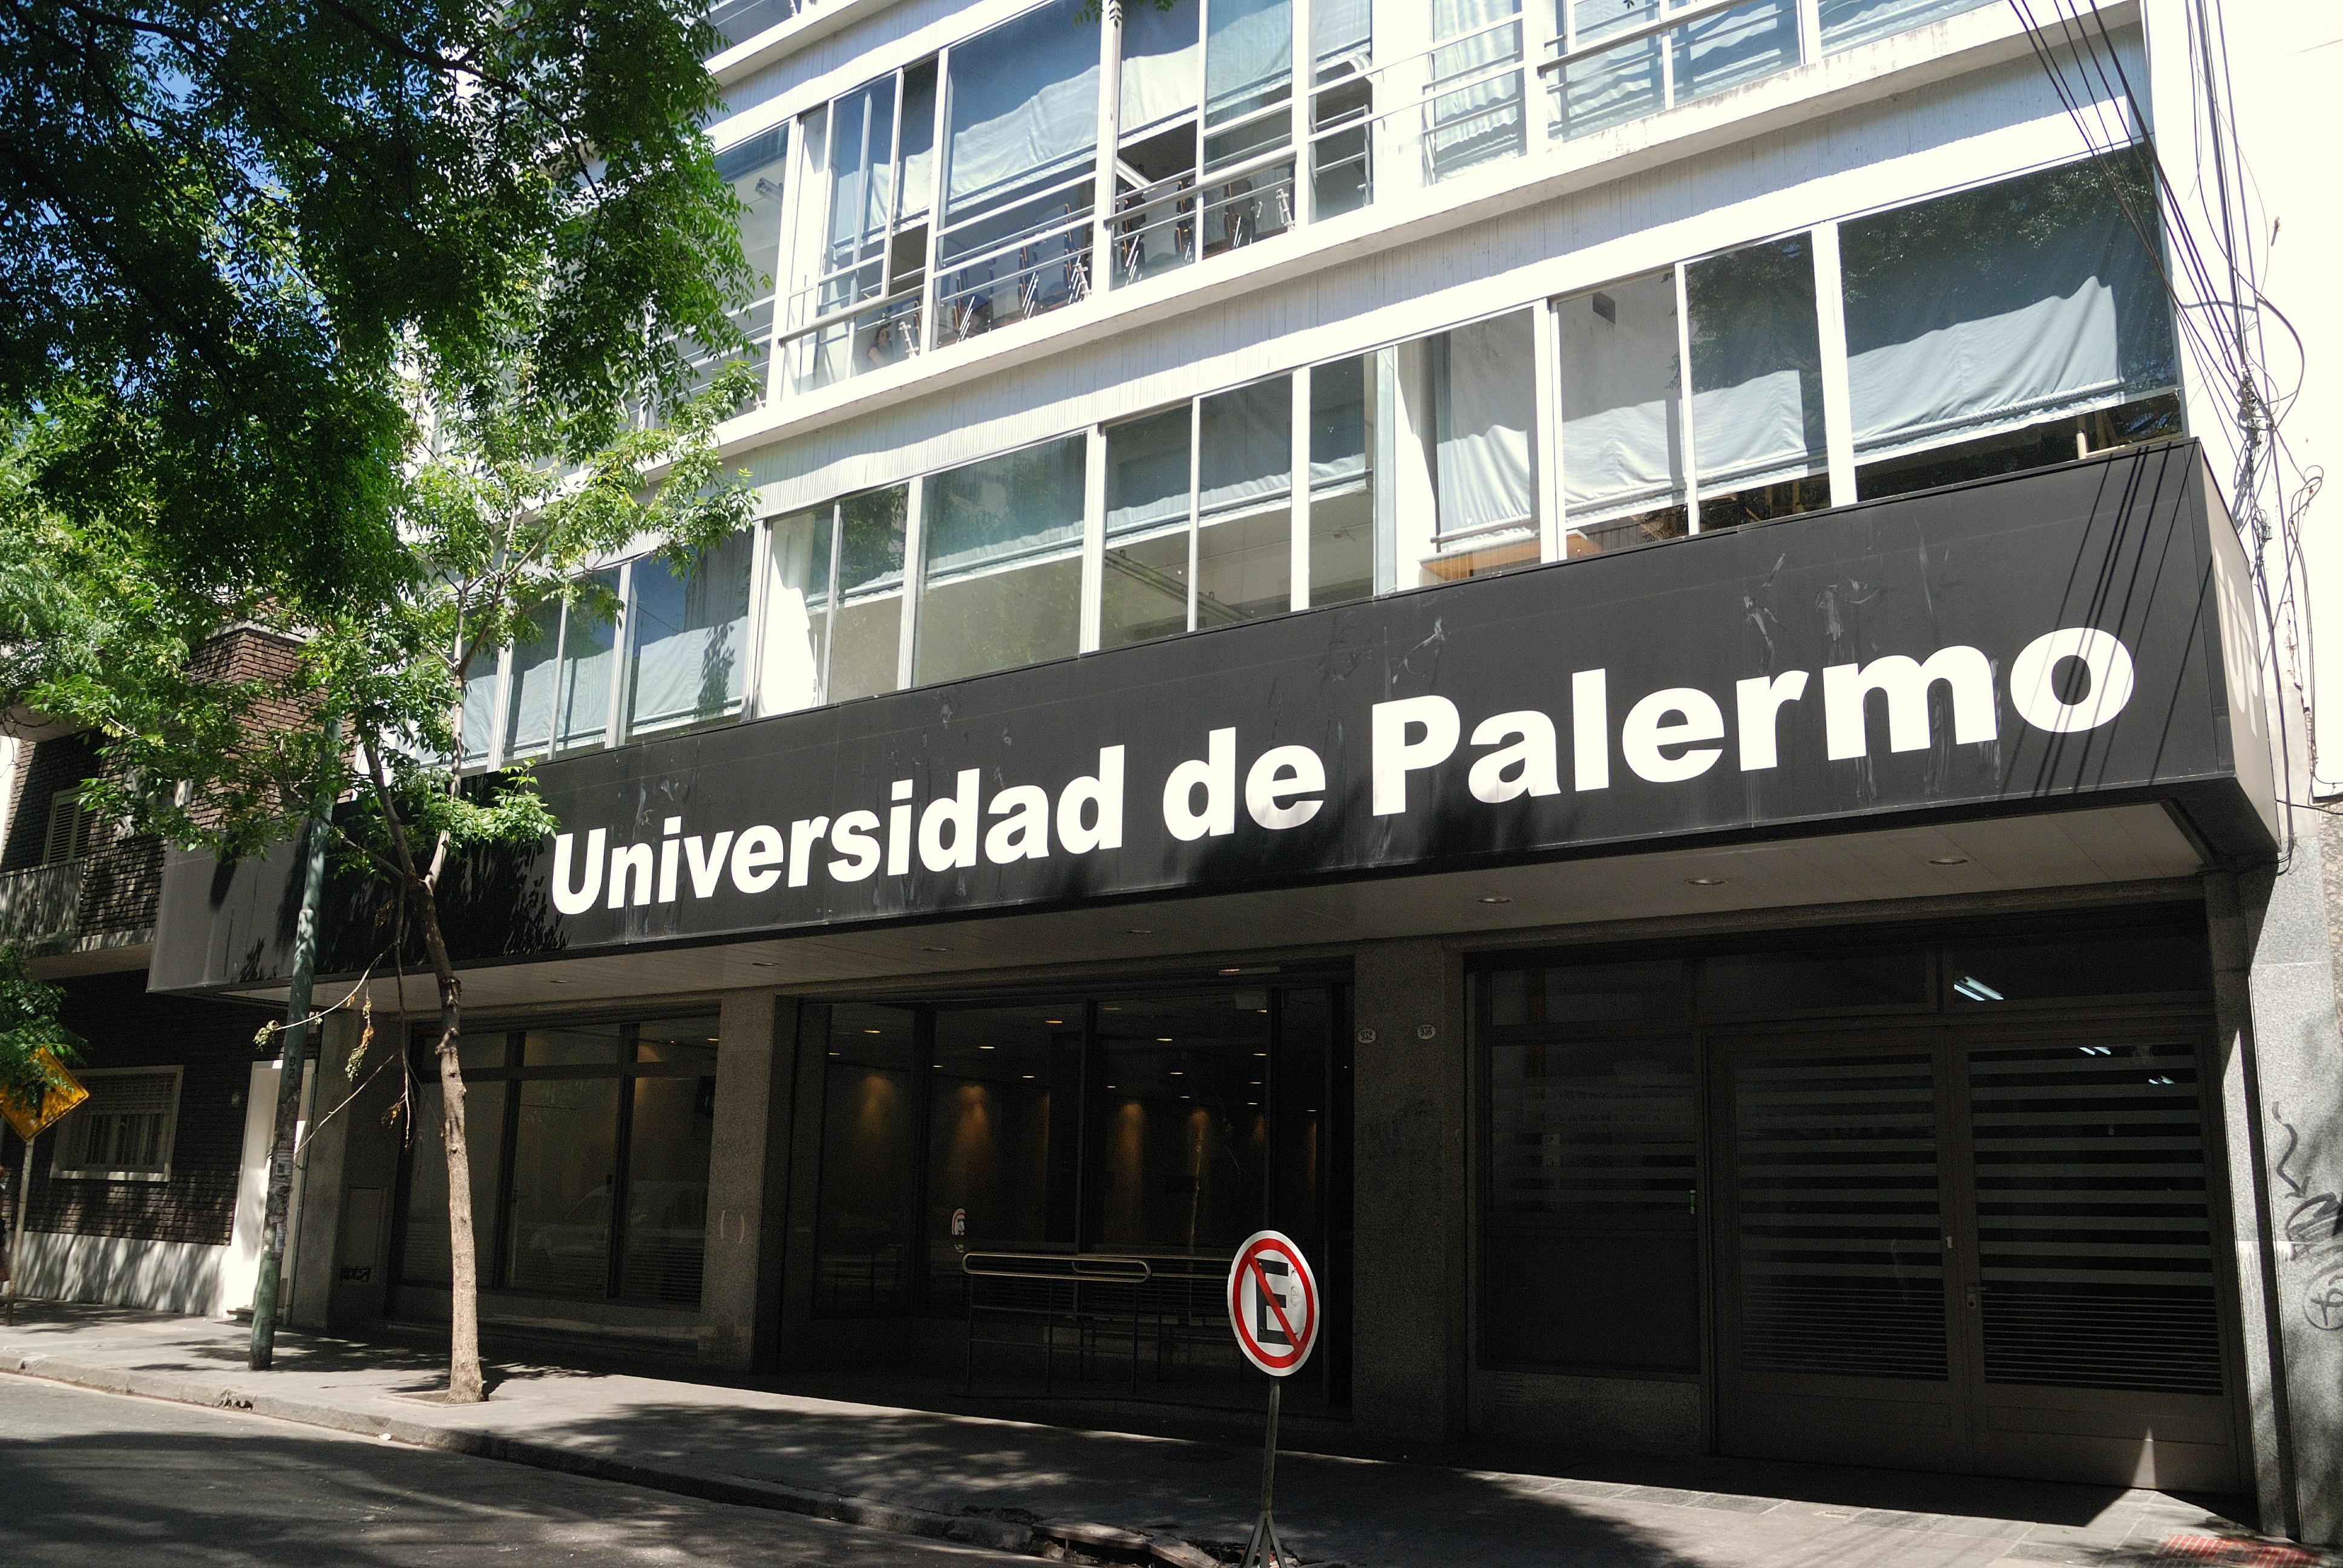 Palermo Universidad